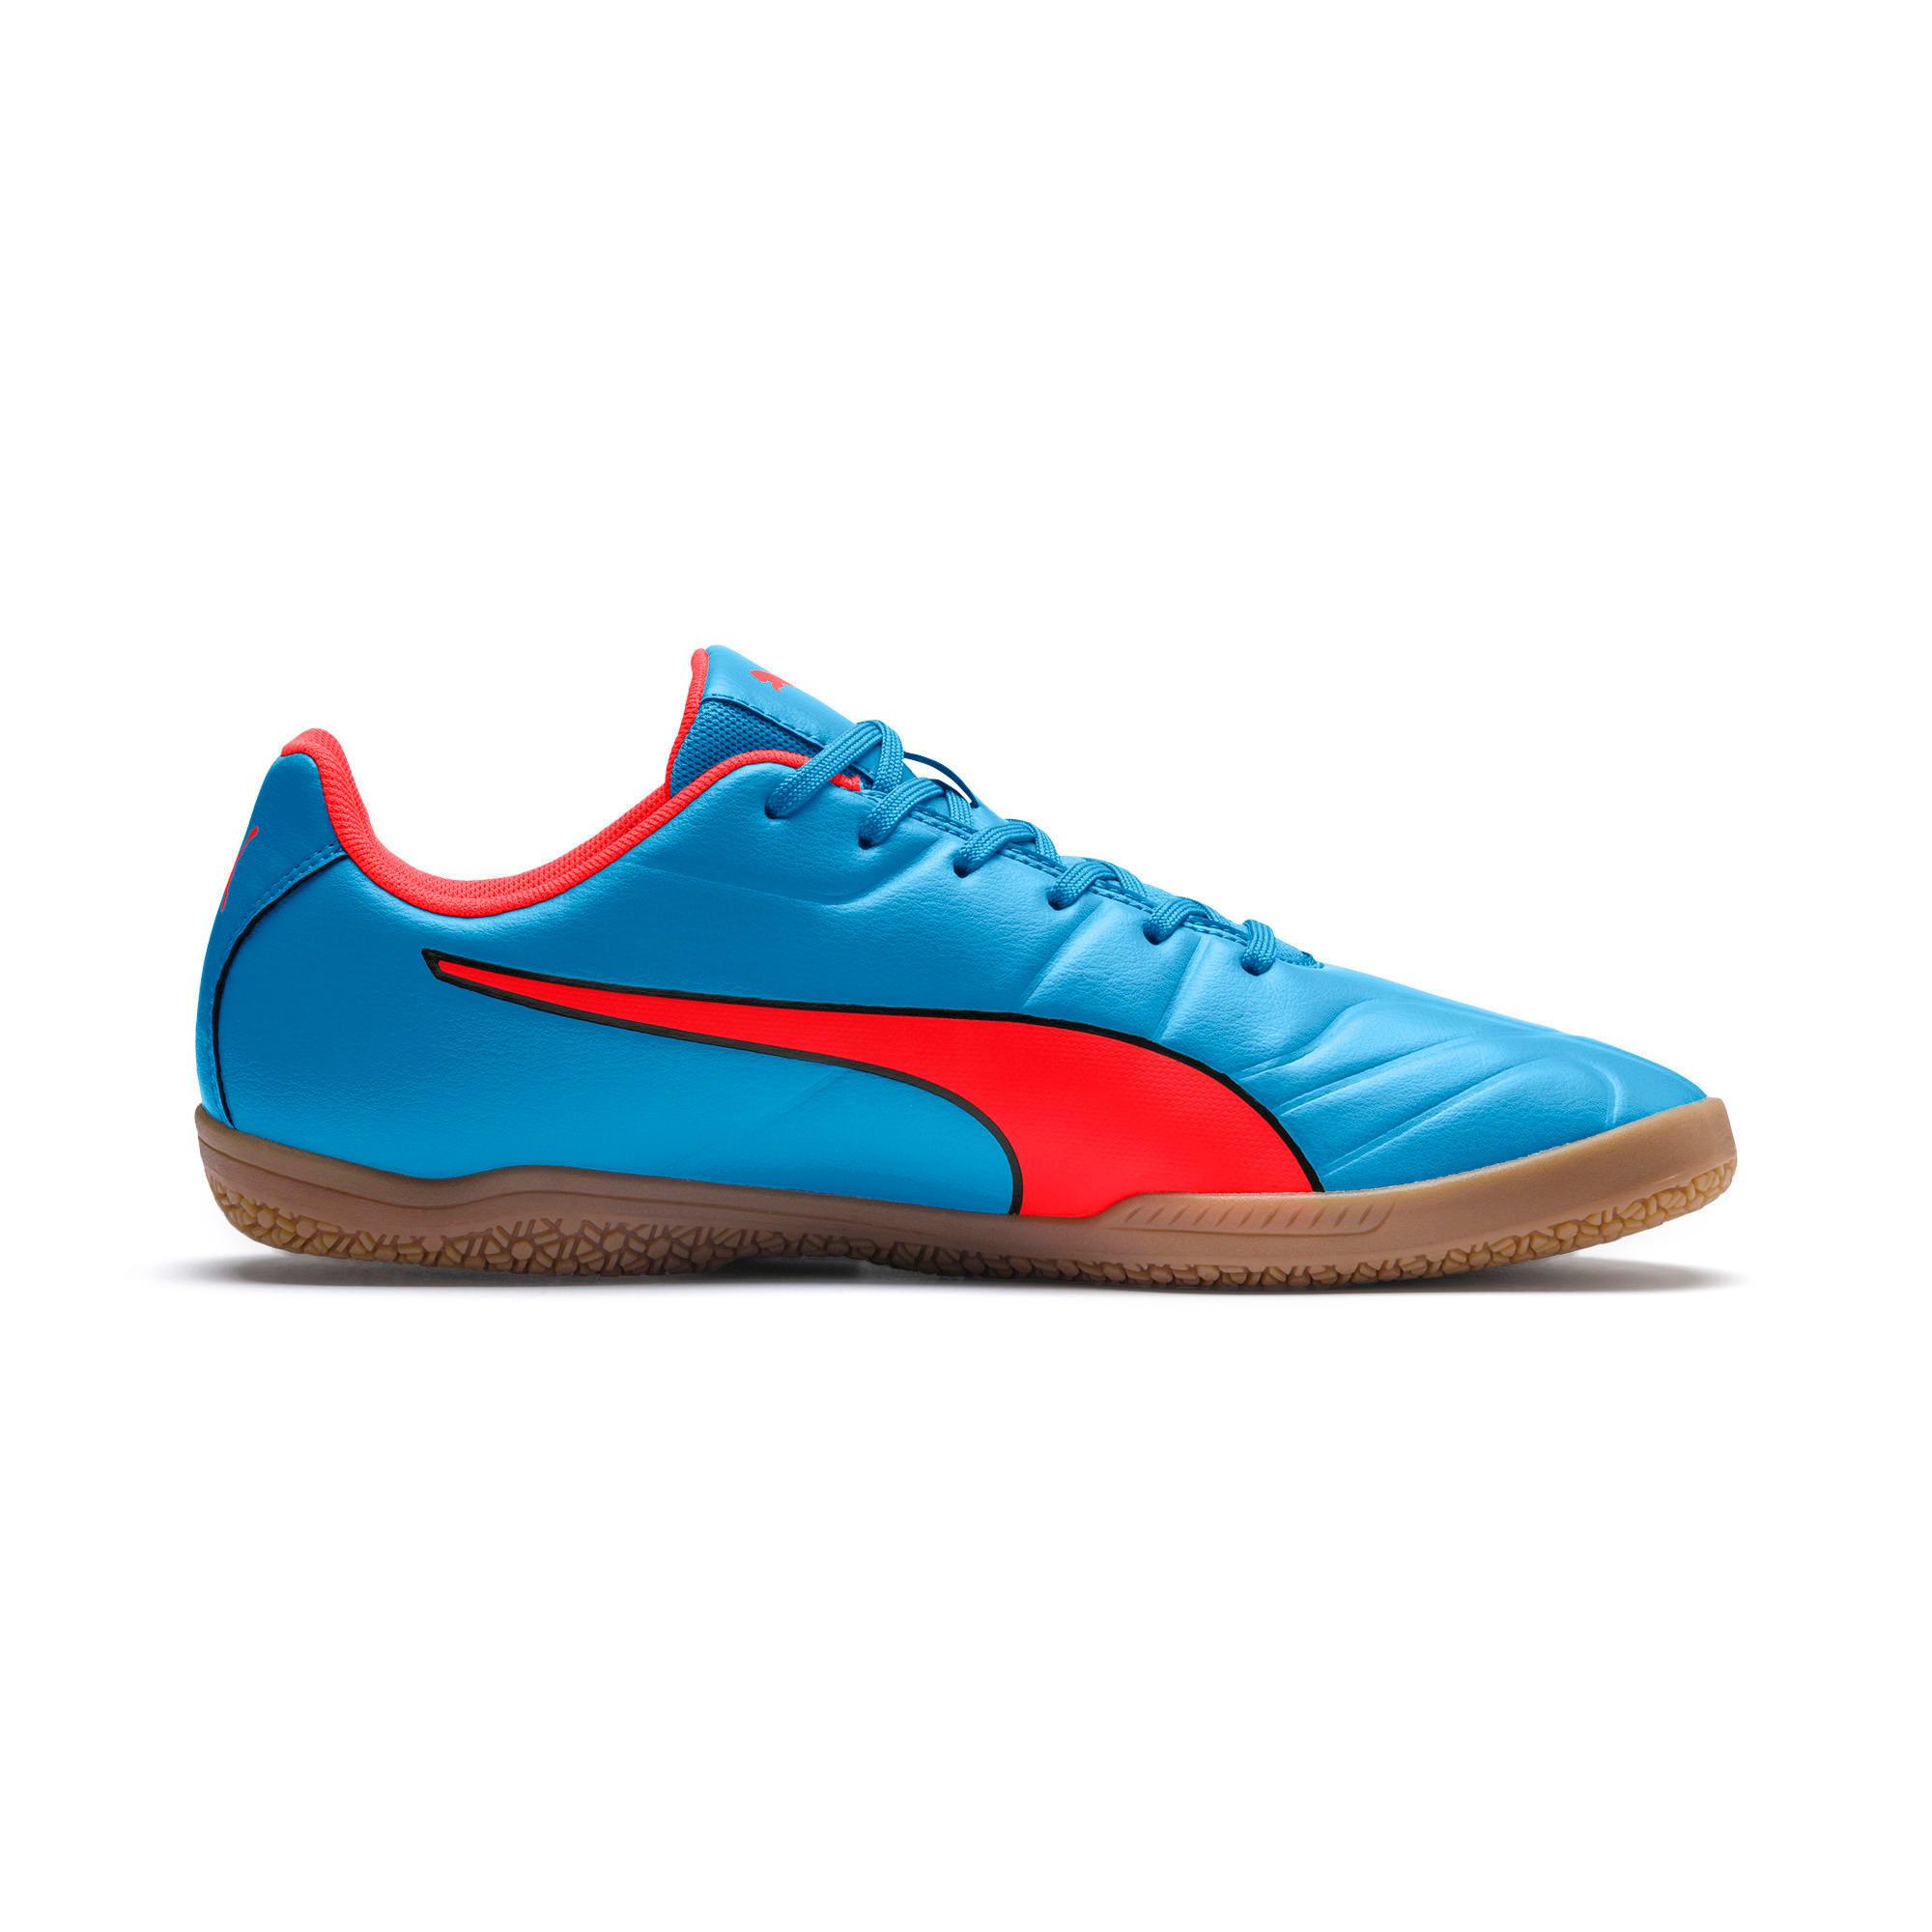 Thumbnail 5 of Classico C II Sala Men's Football Boots, Bleu Azur-Red Blast-Black, medium-IND